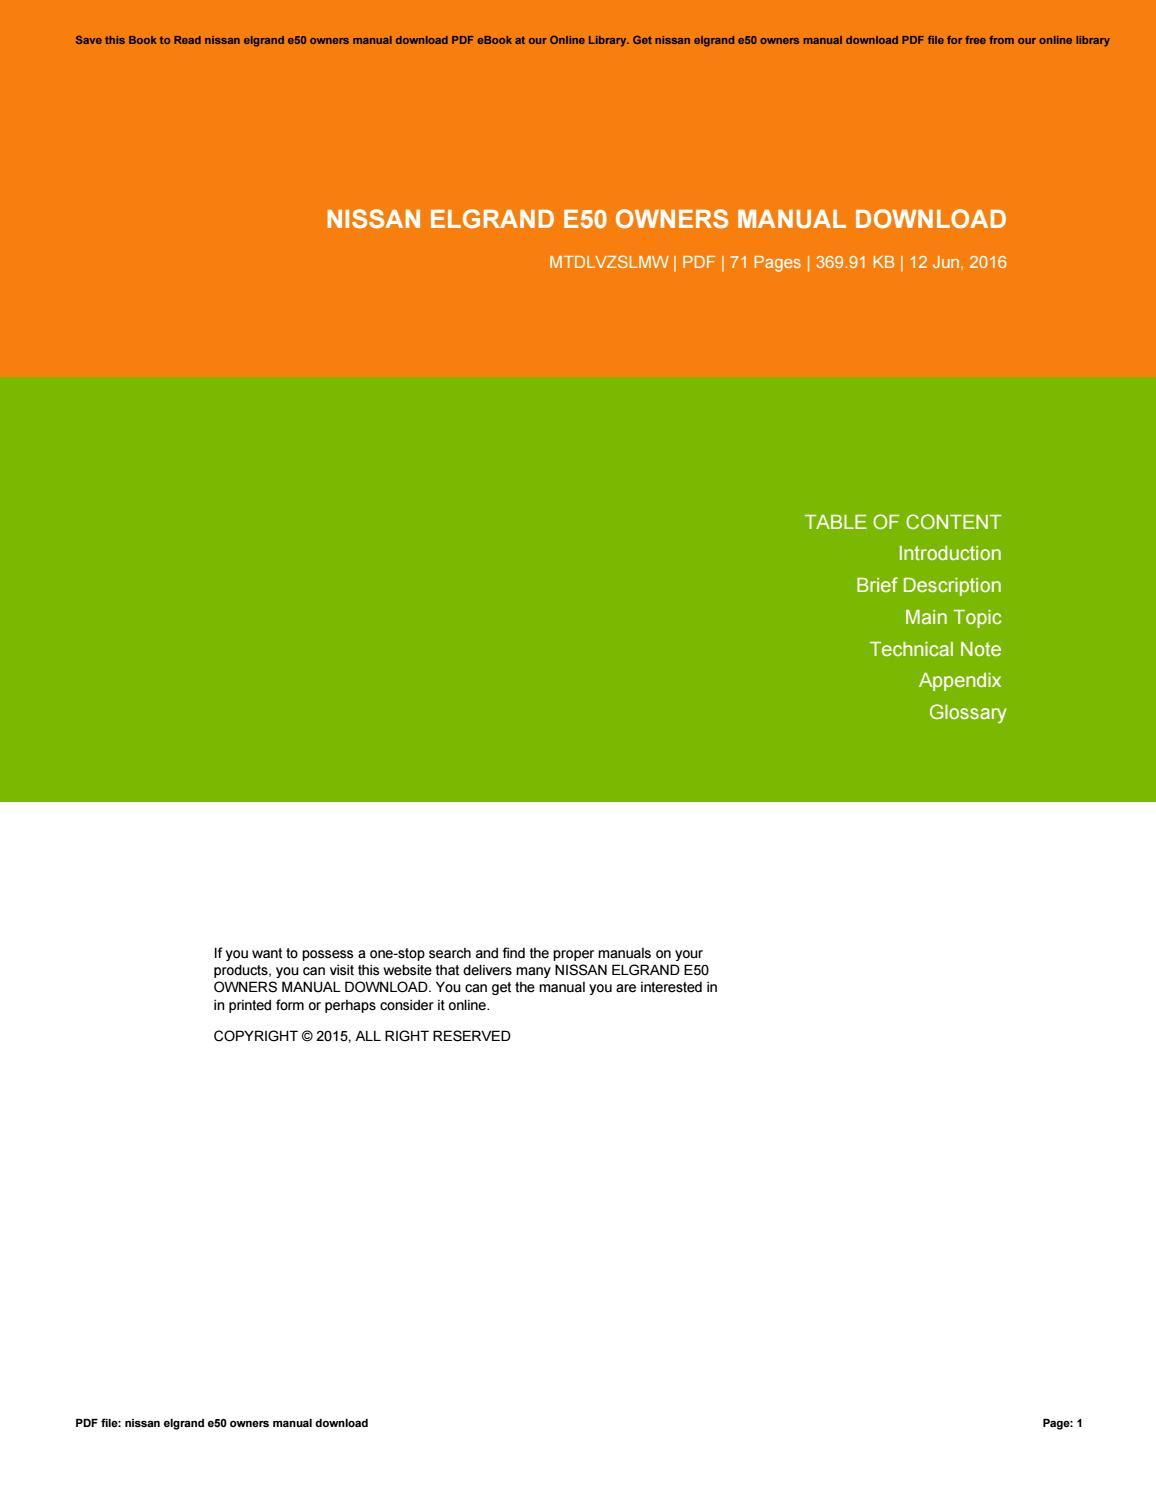 Nissan elgrand e50 owners manual english.